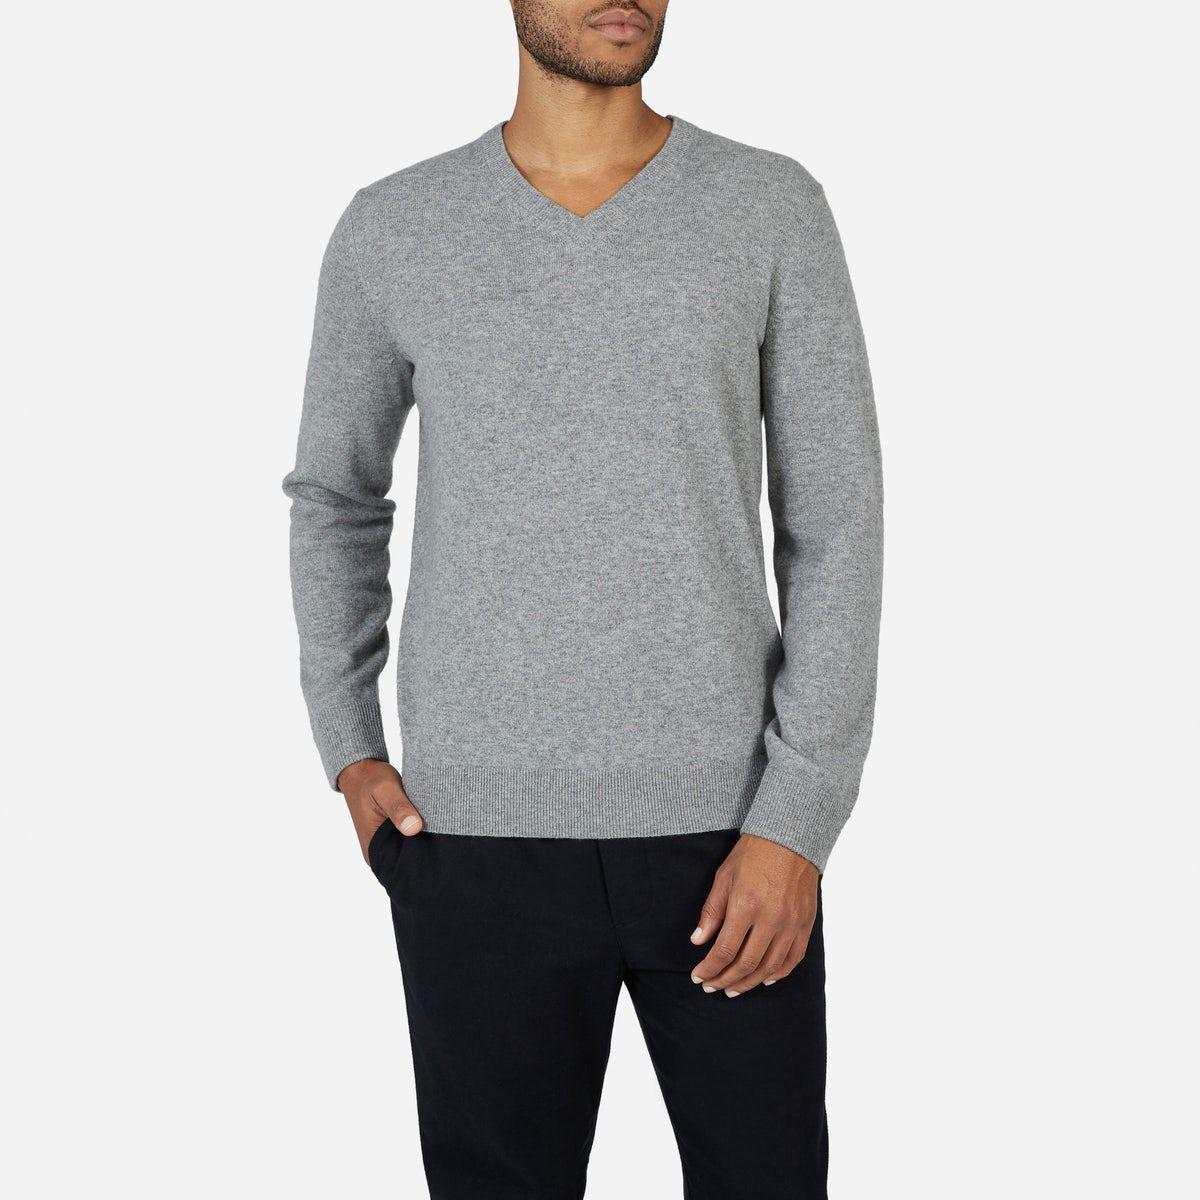 Men S Cashmere V Neck Everlane Mens Cashmere Men Sweater Cashmere [ 1200 x 1200 Pixel ]